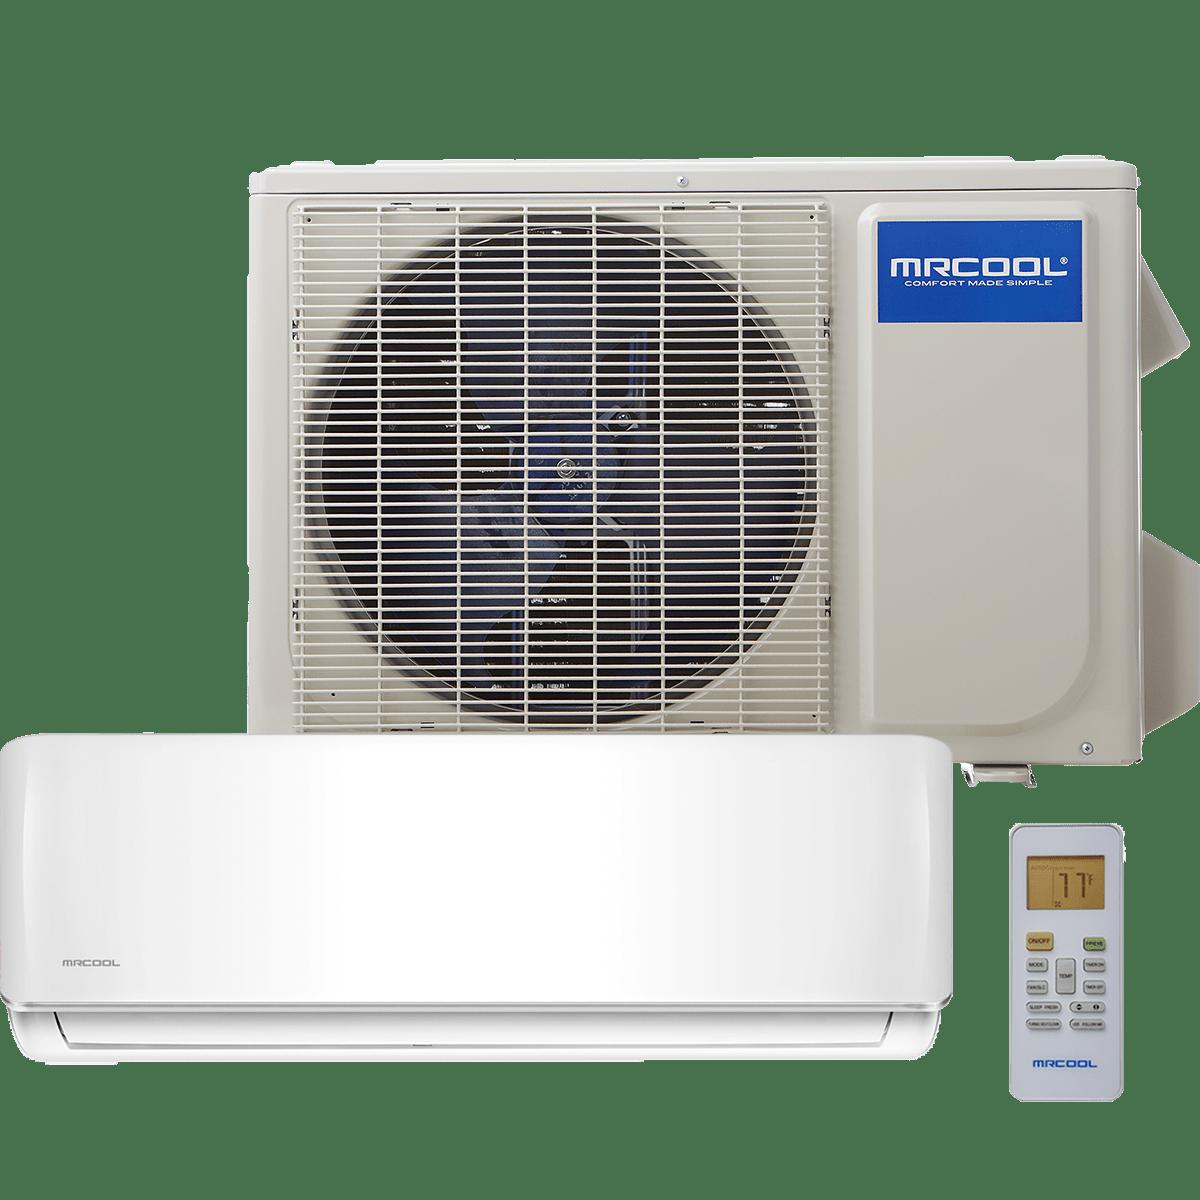 MRCOOL Oasis 12,000 BTU Mini Split with Heat Pump mr7785k